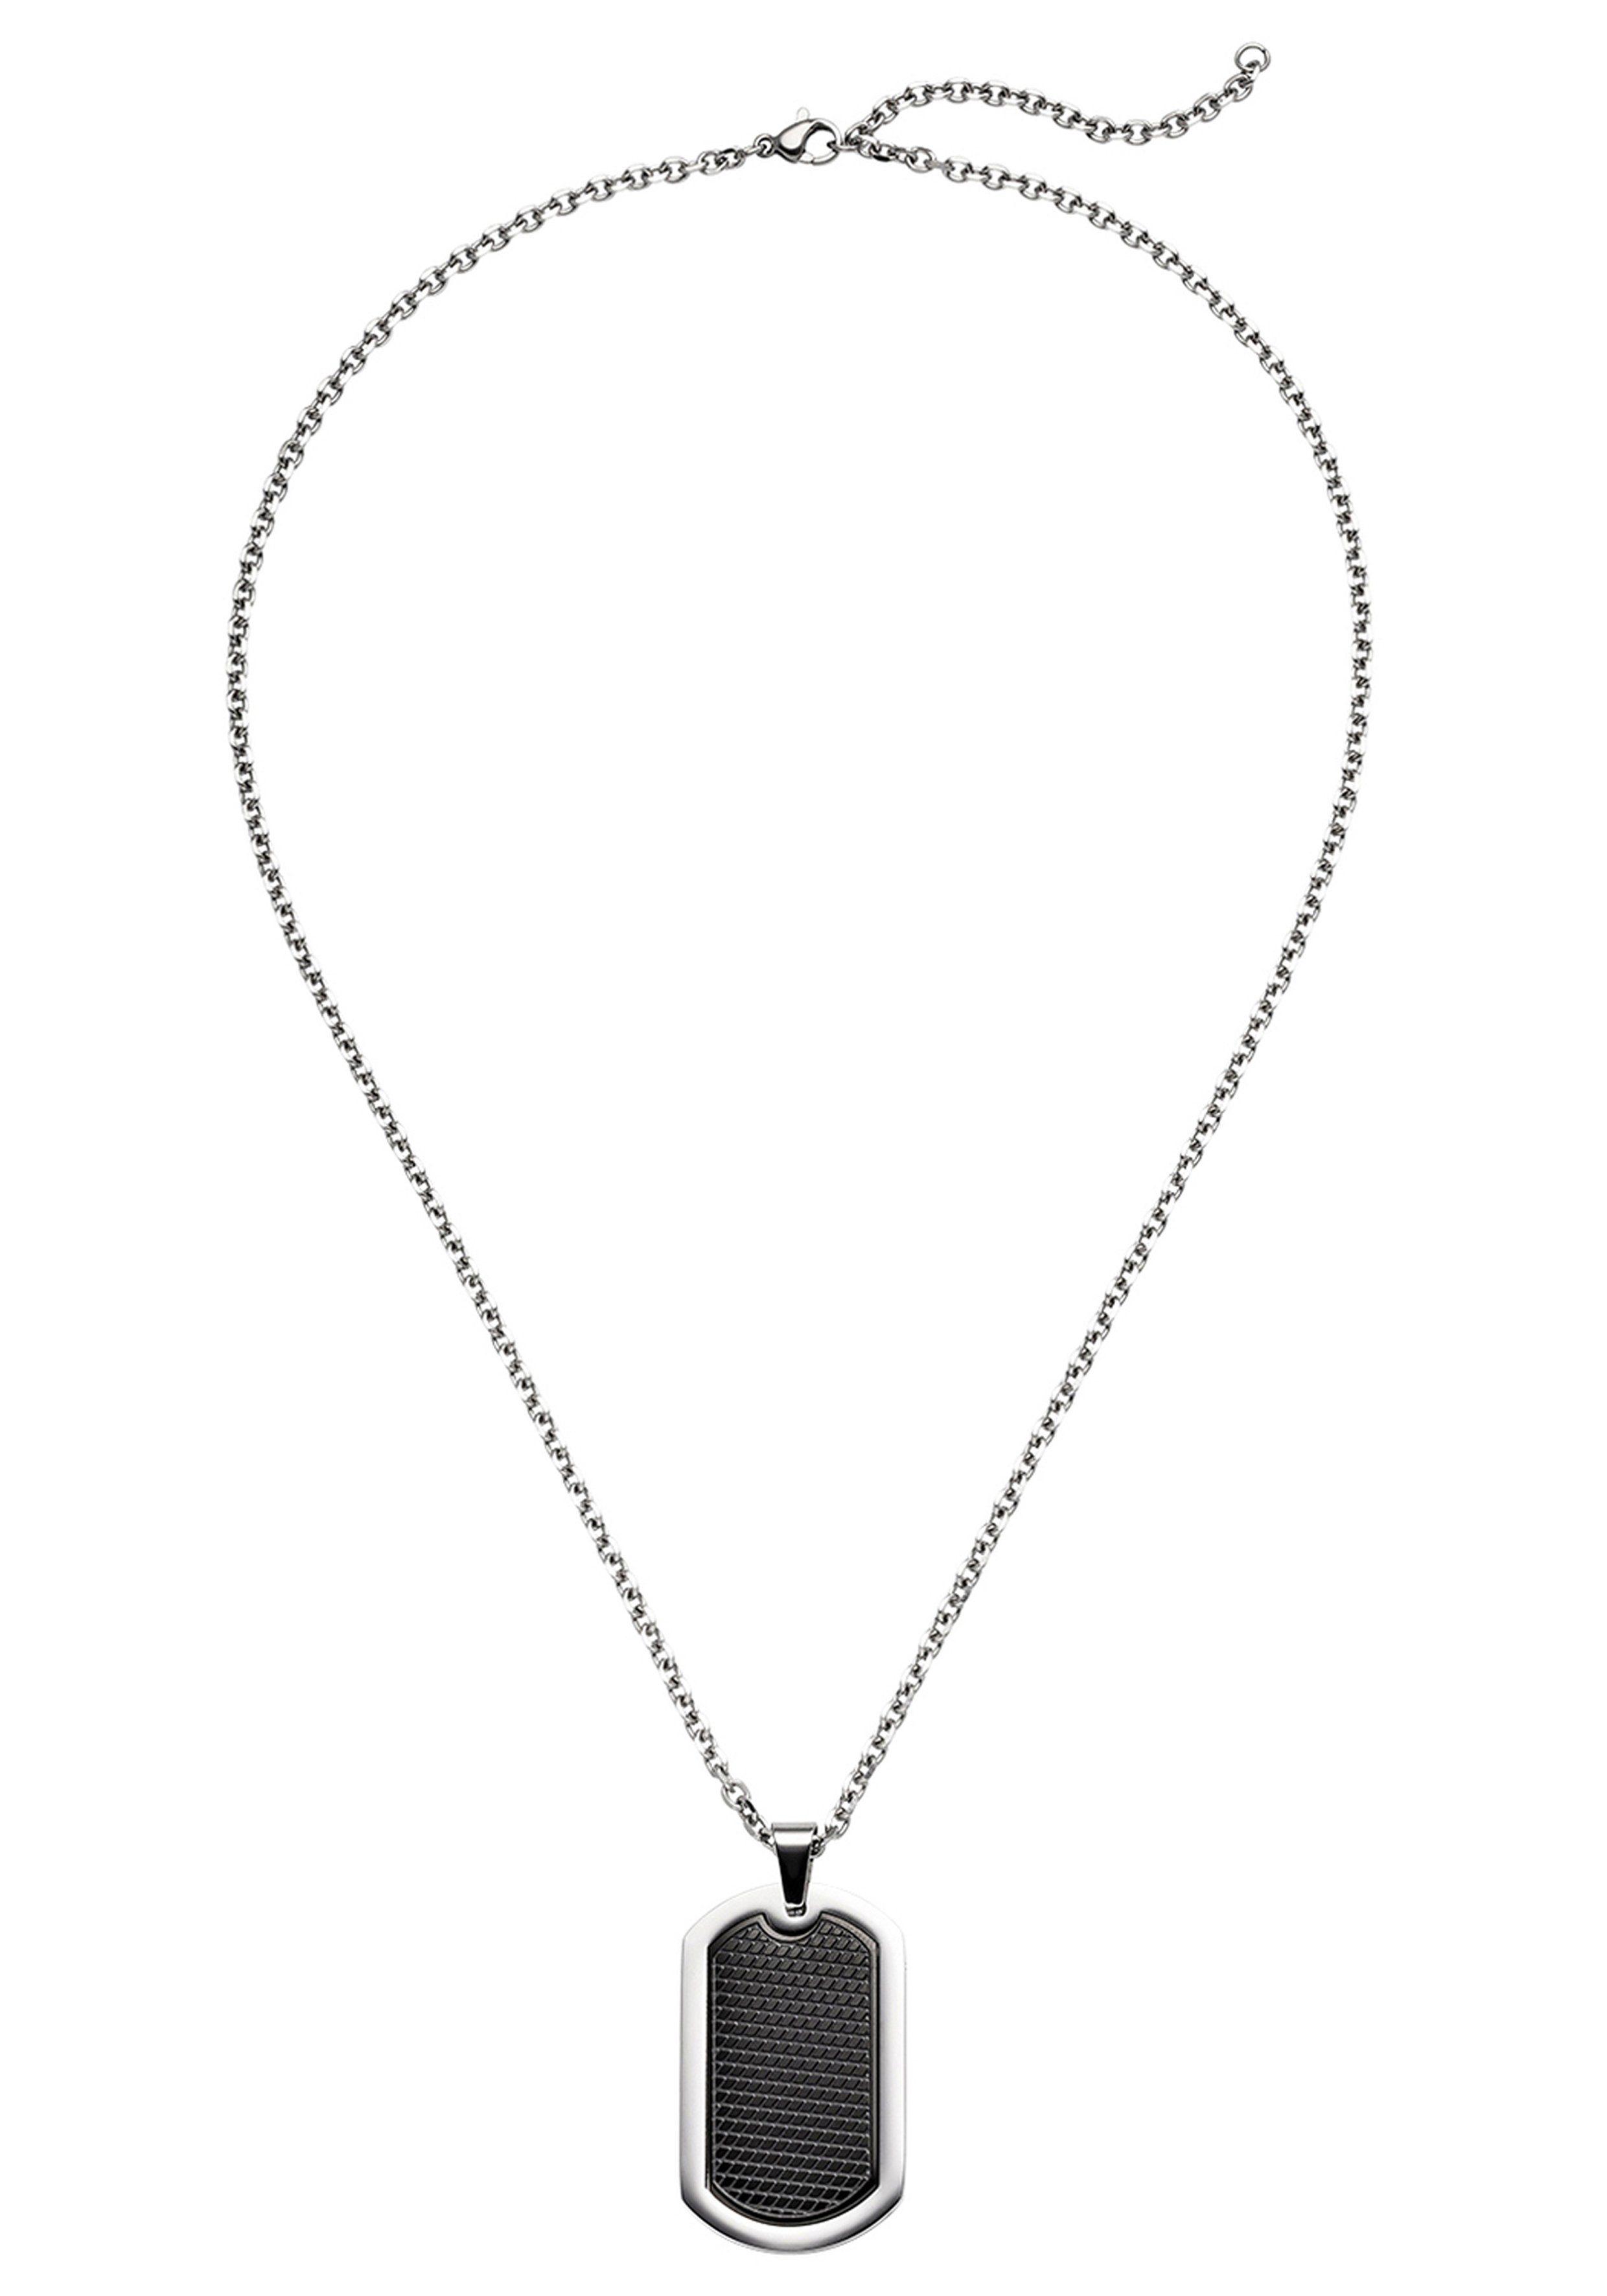 JOBO Kette mit Anhänger Edelstahl 55 cm